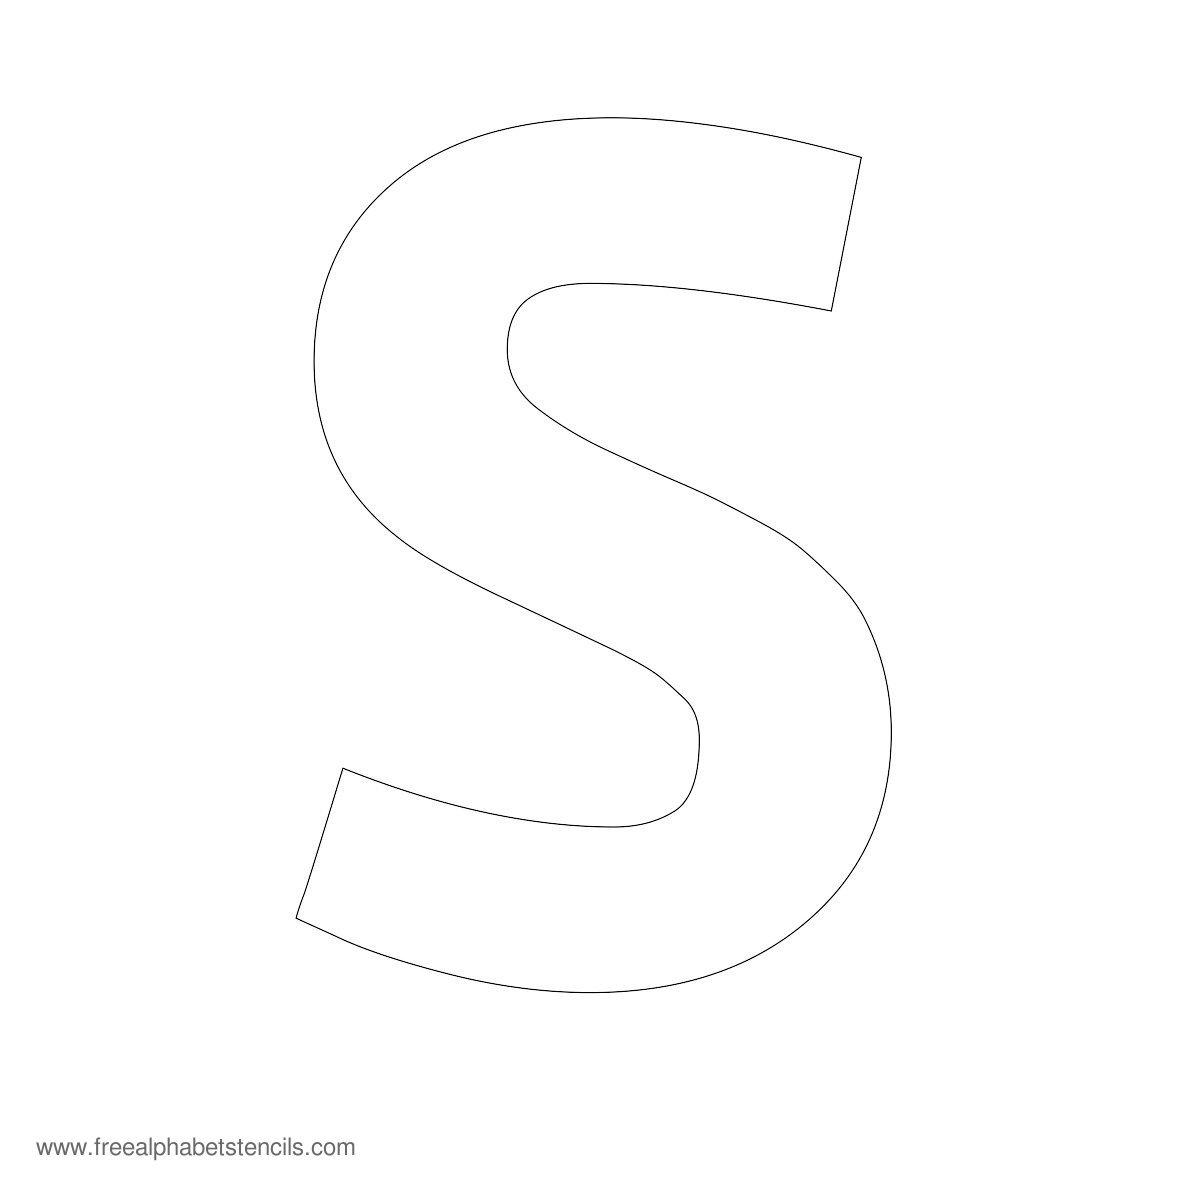 Large Alphabet Stencils | Freealphabetstencils with regard to Tracing Stencils Letters